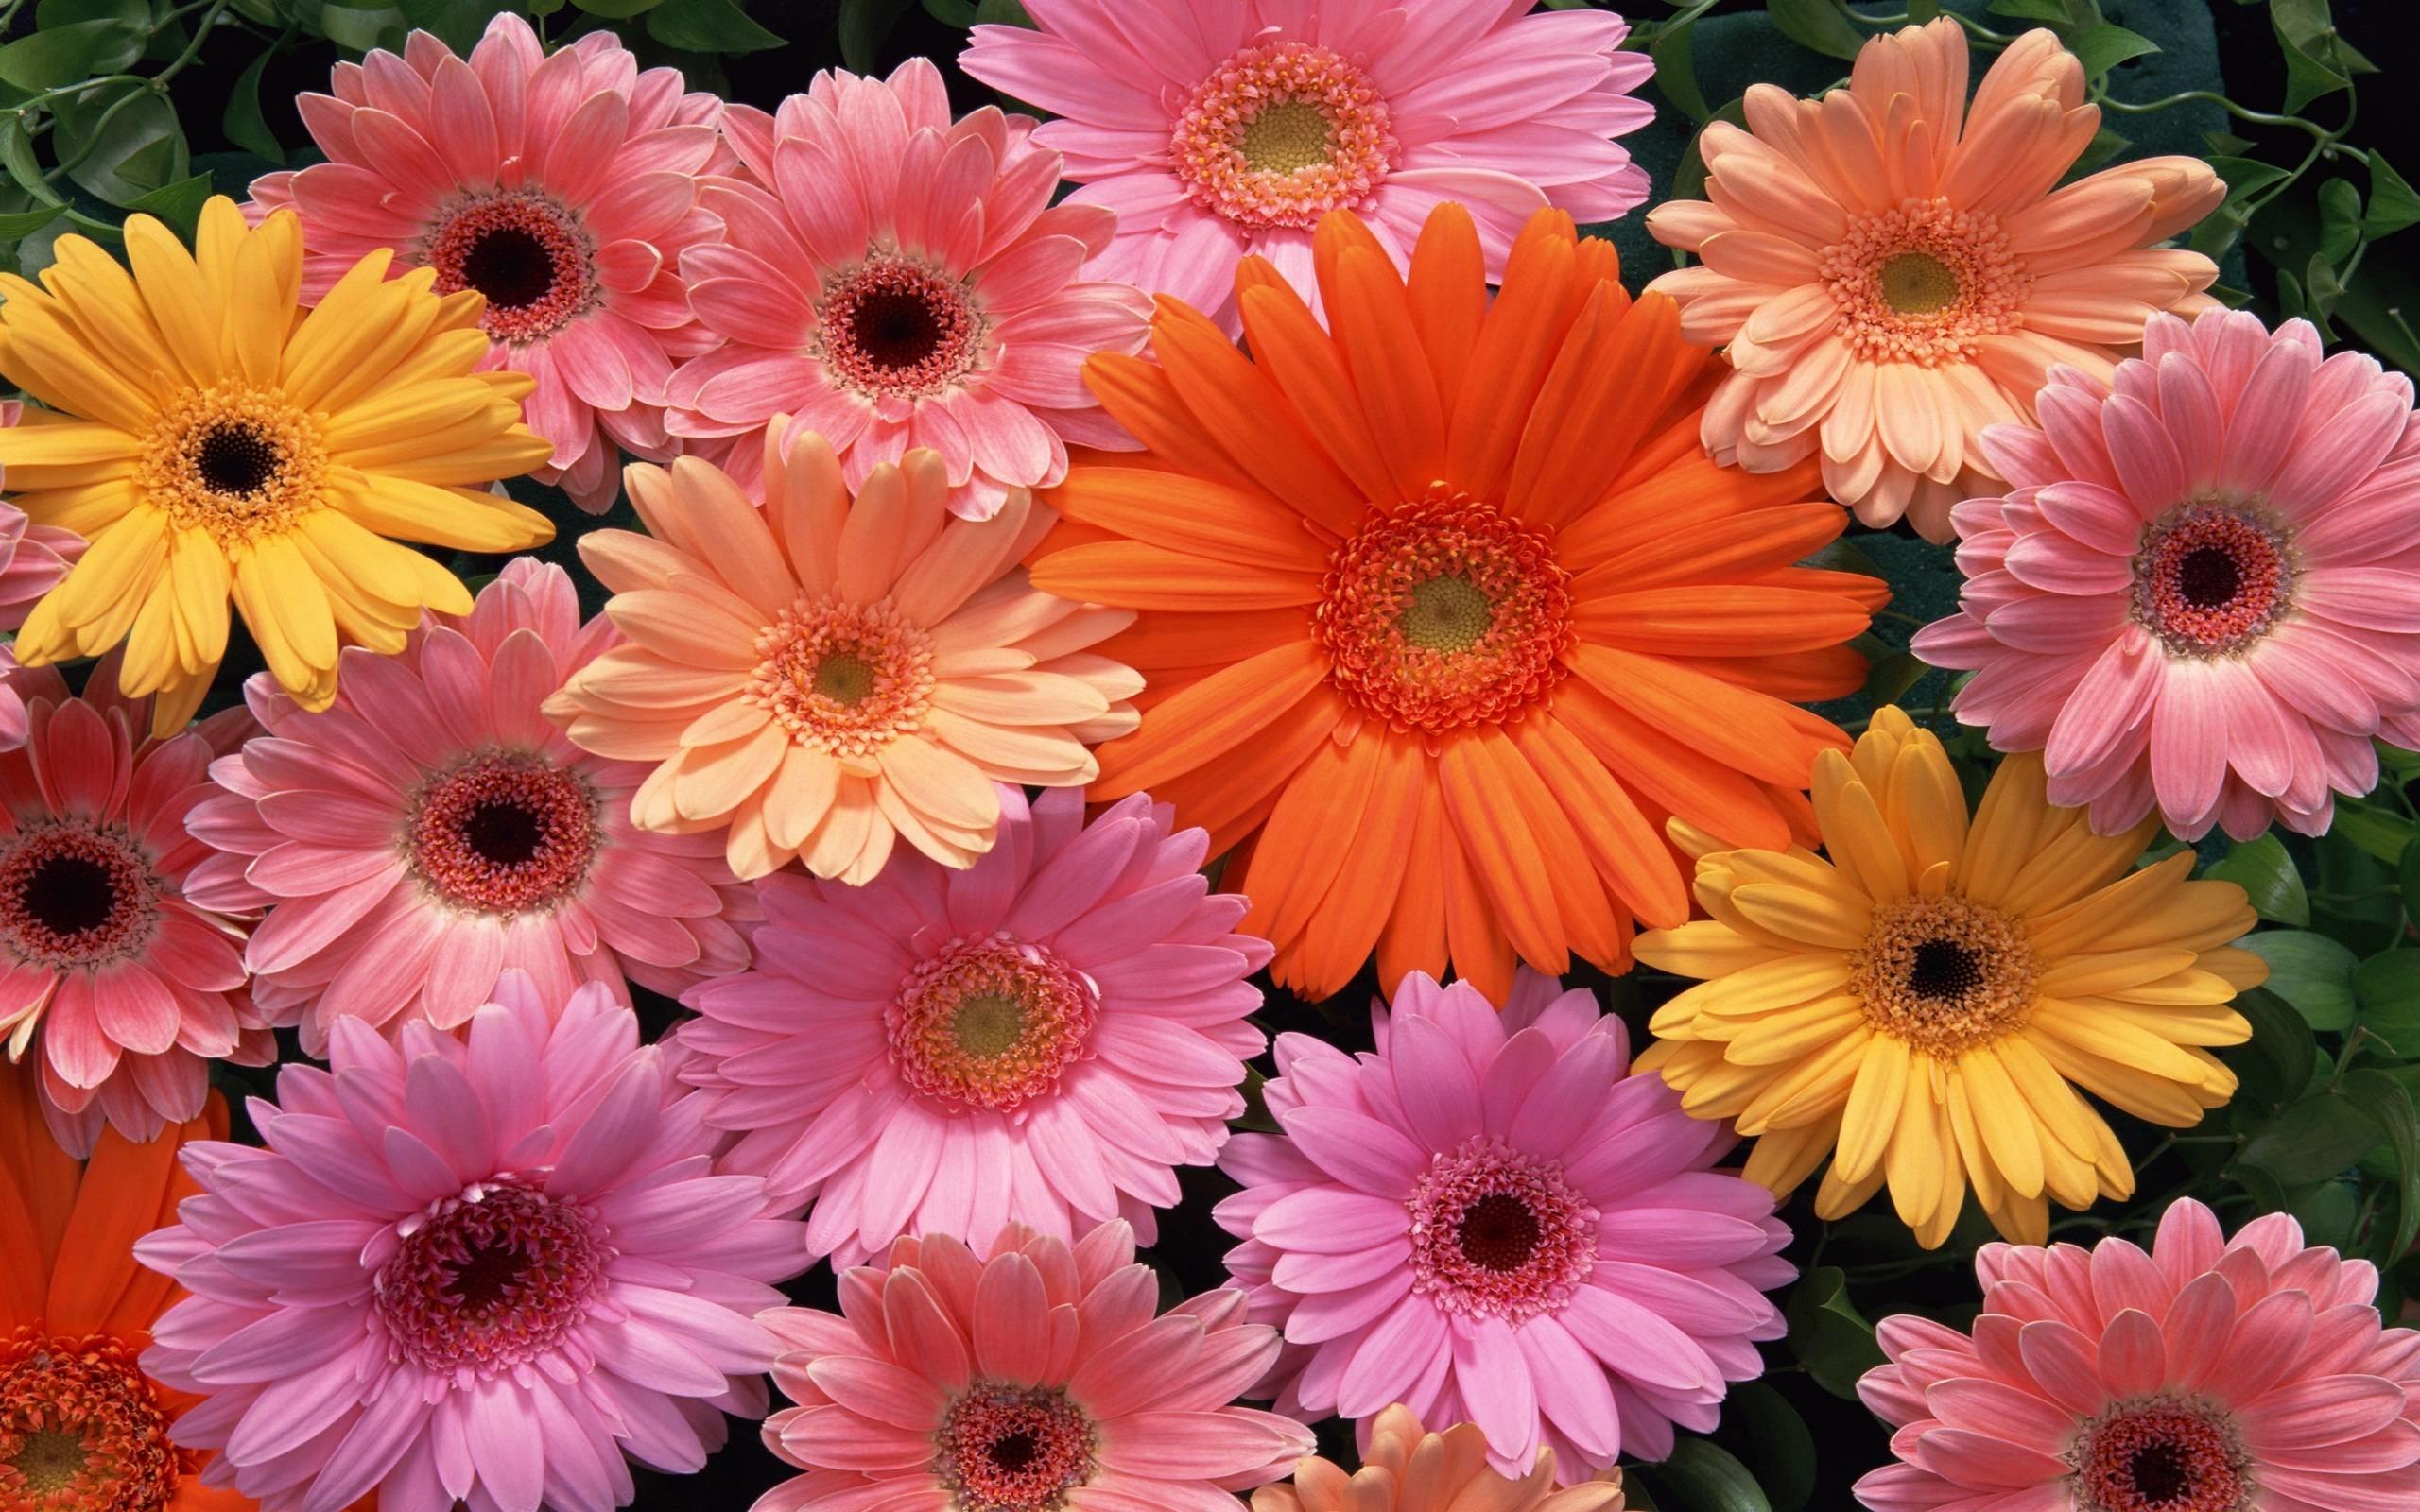 beautiful flowers wallpaper ·①